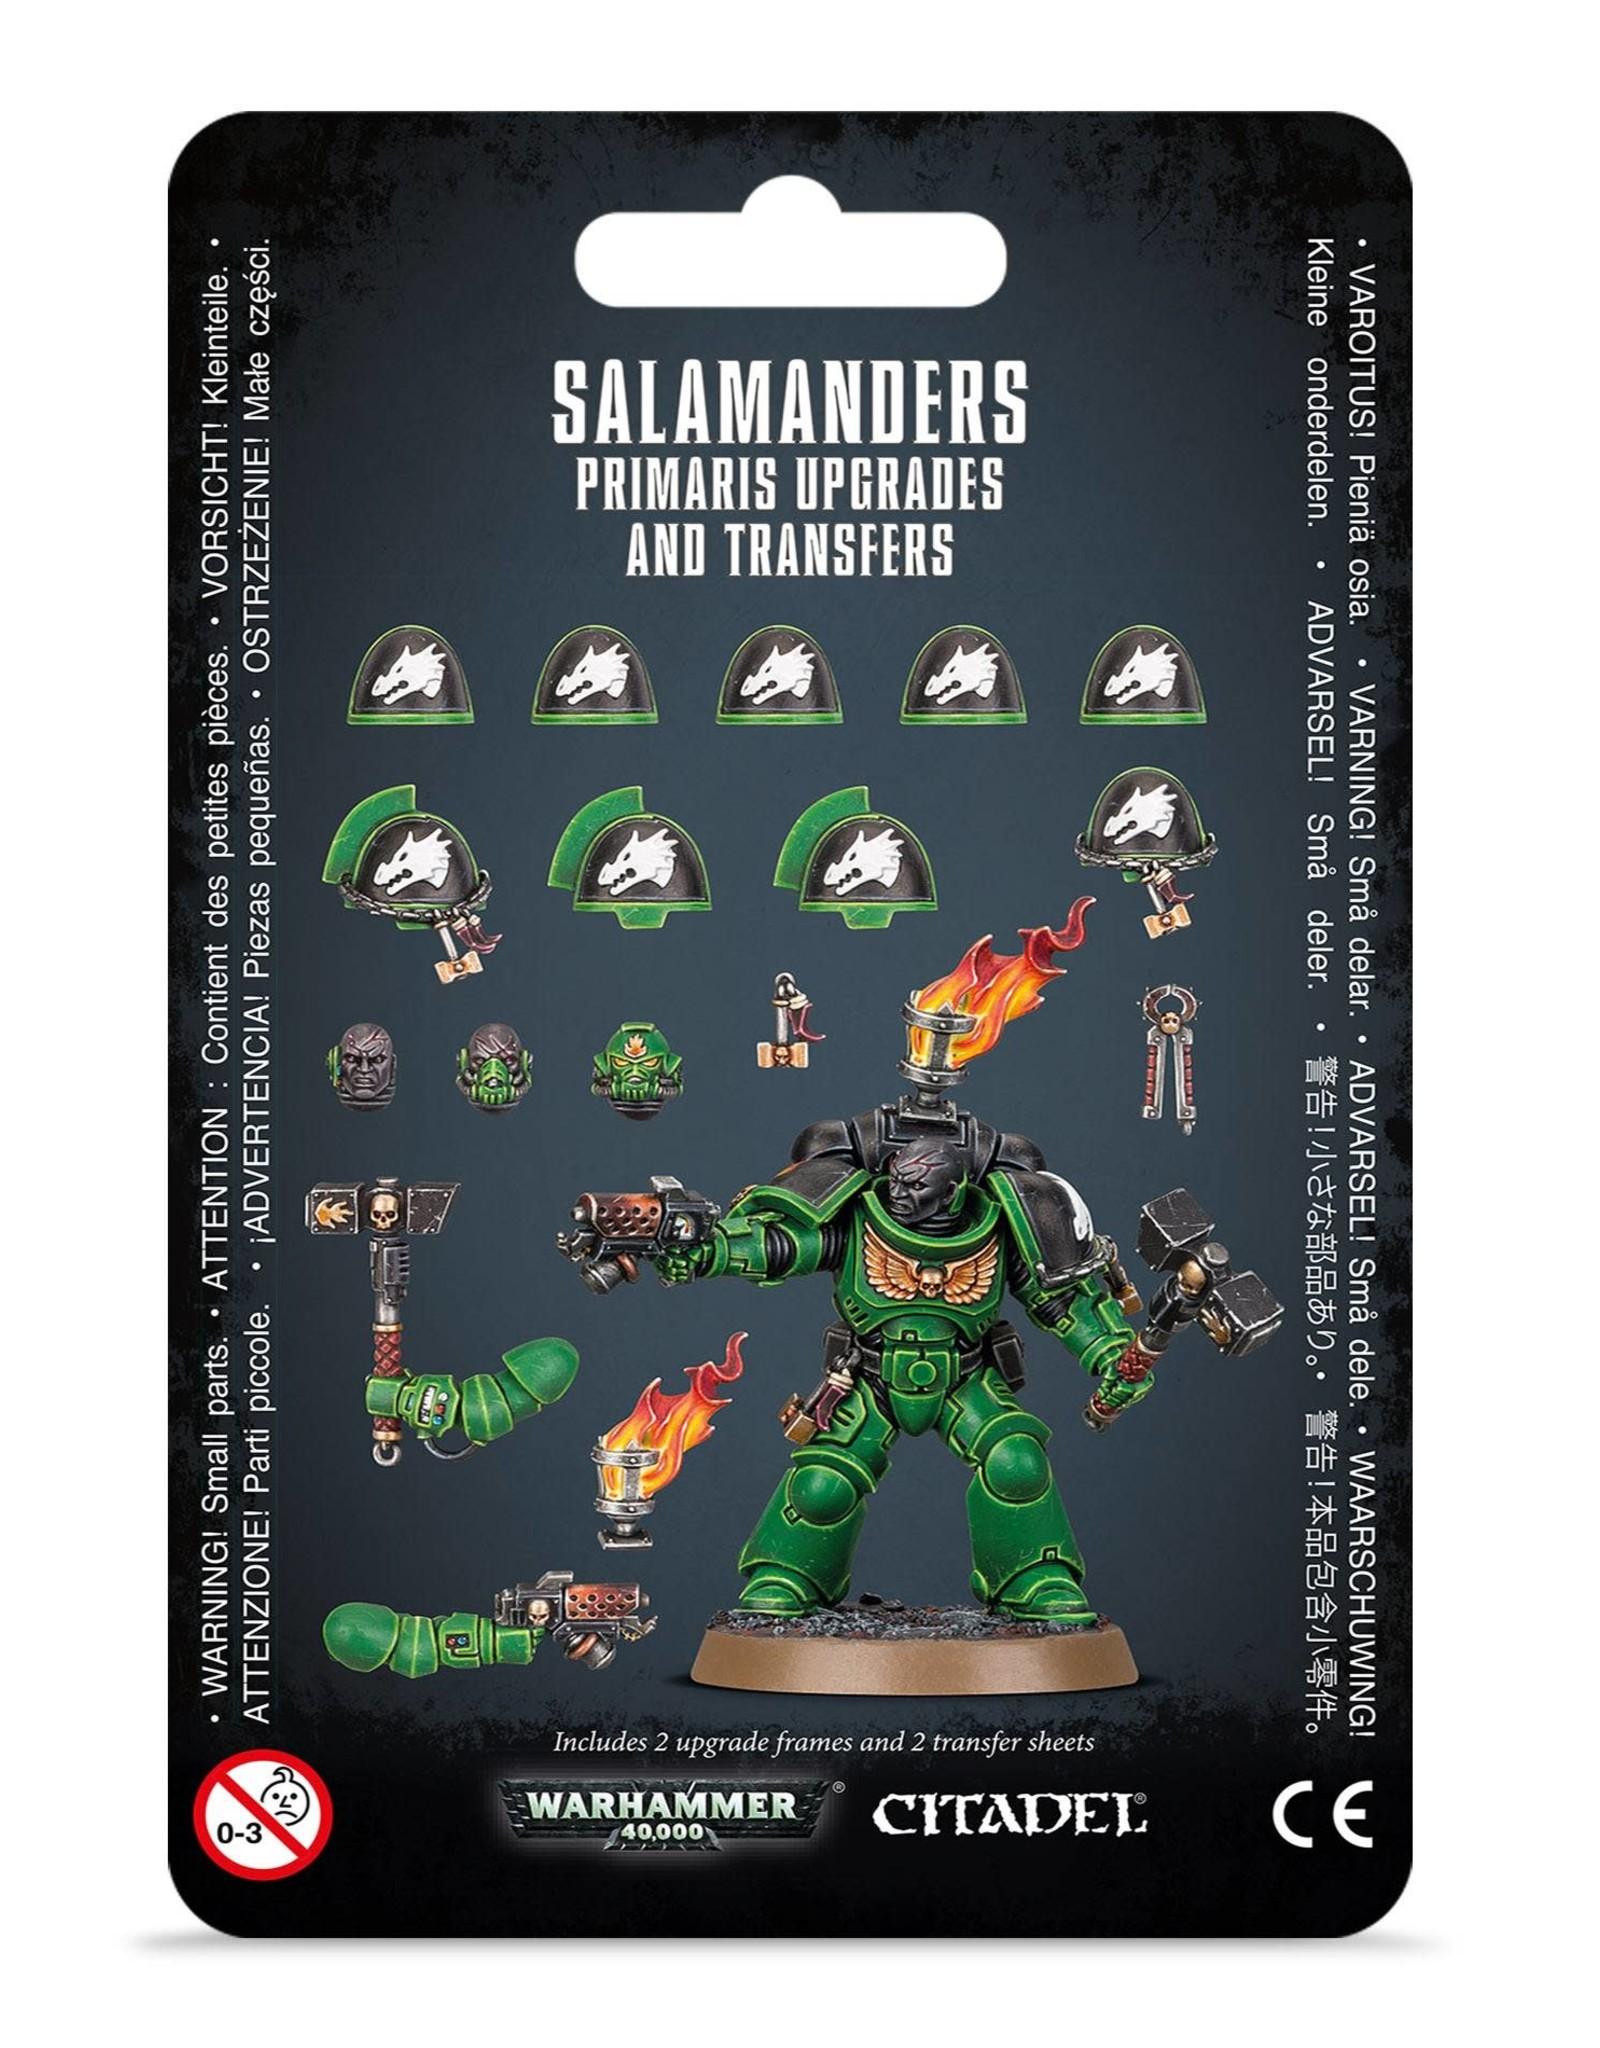 Warhammer 40K Salamanders Primaris  Upgrades and Transfers